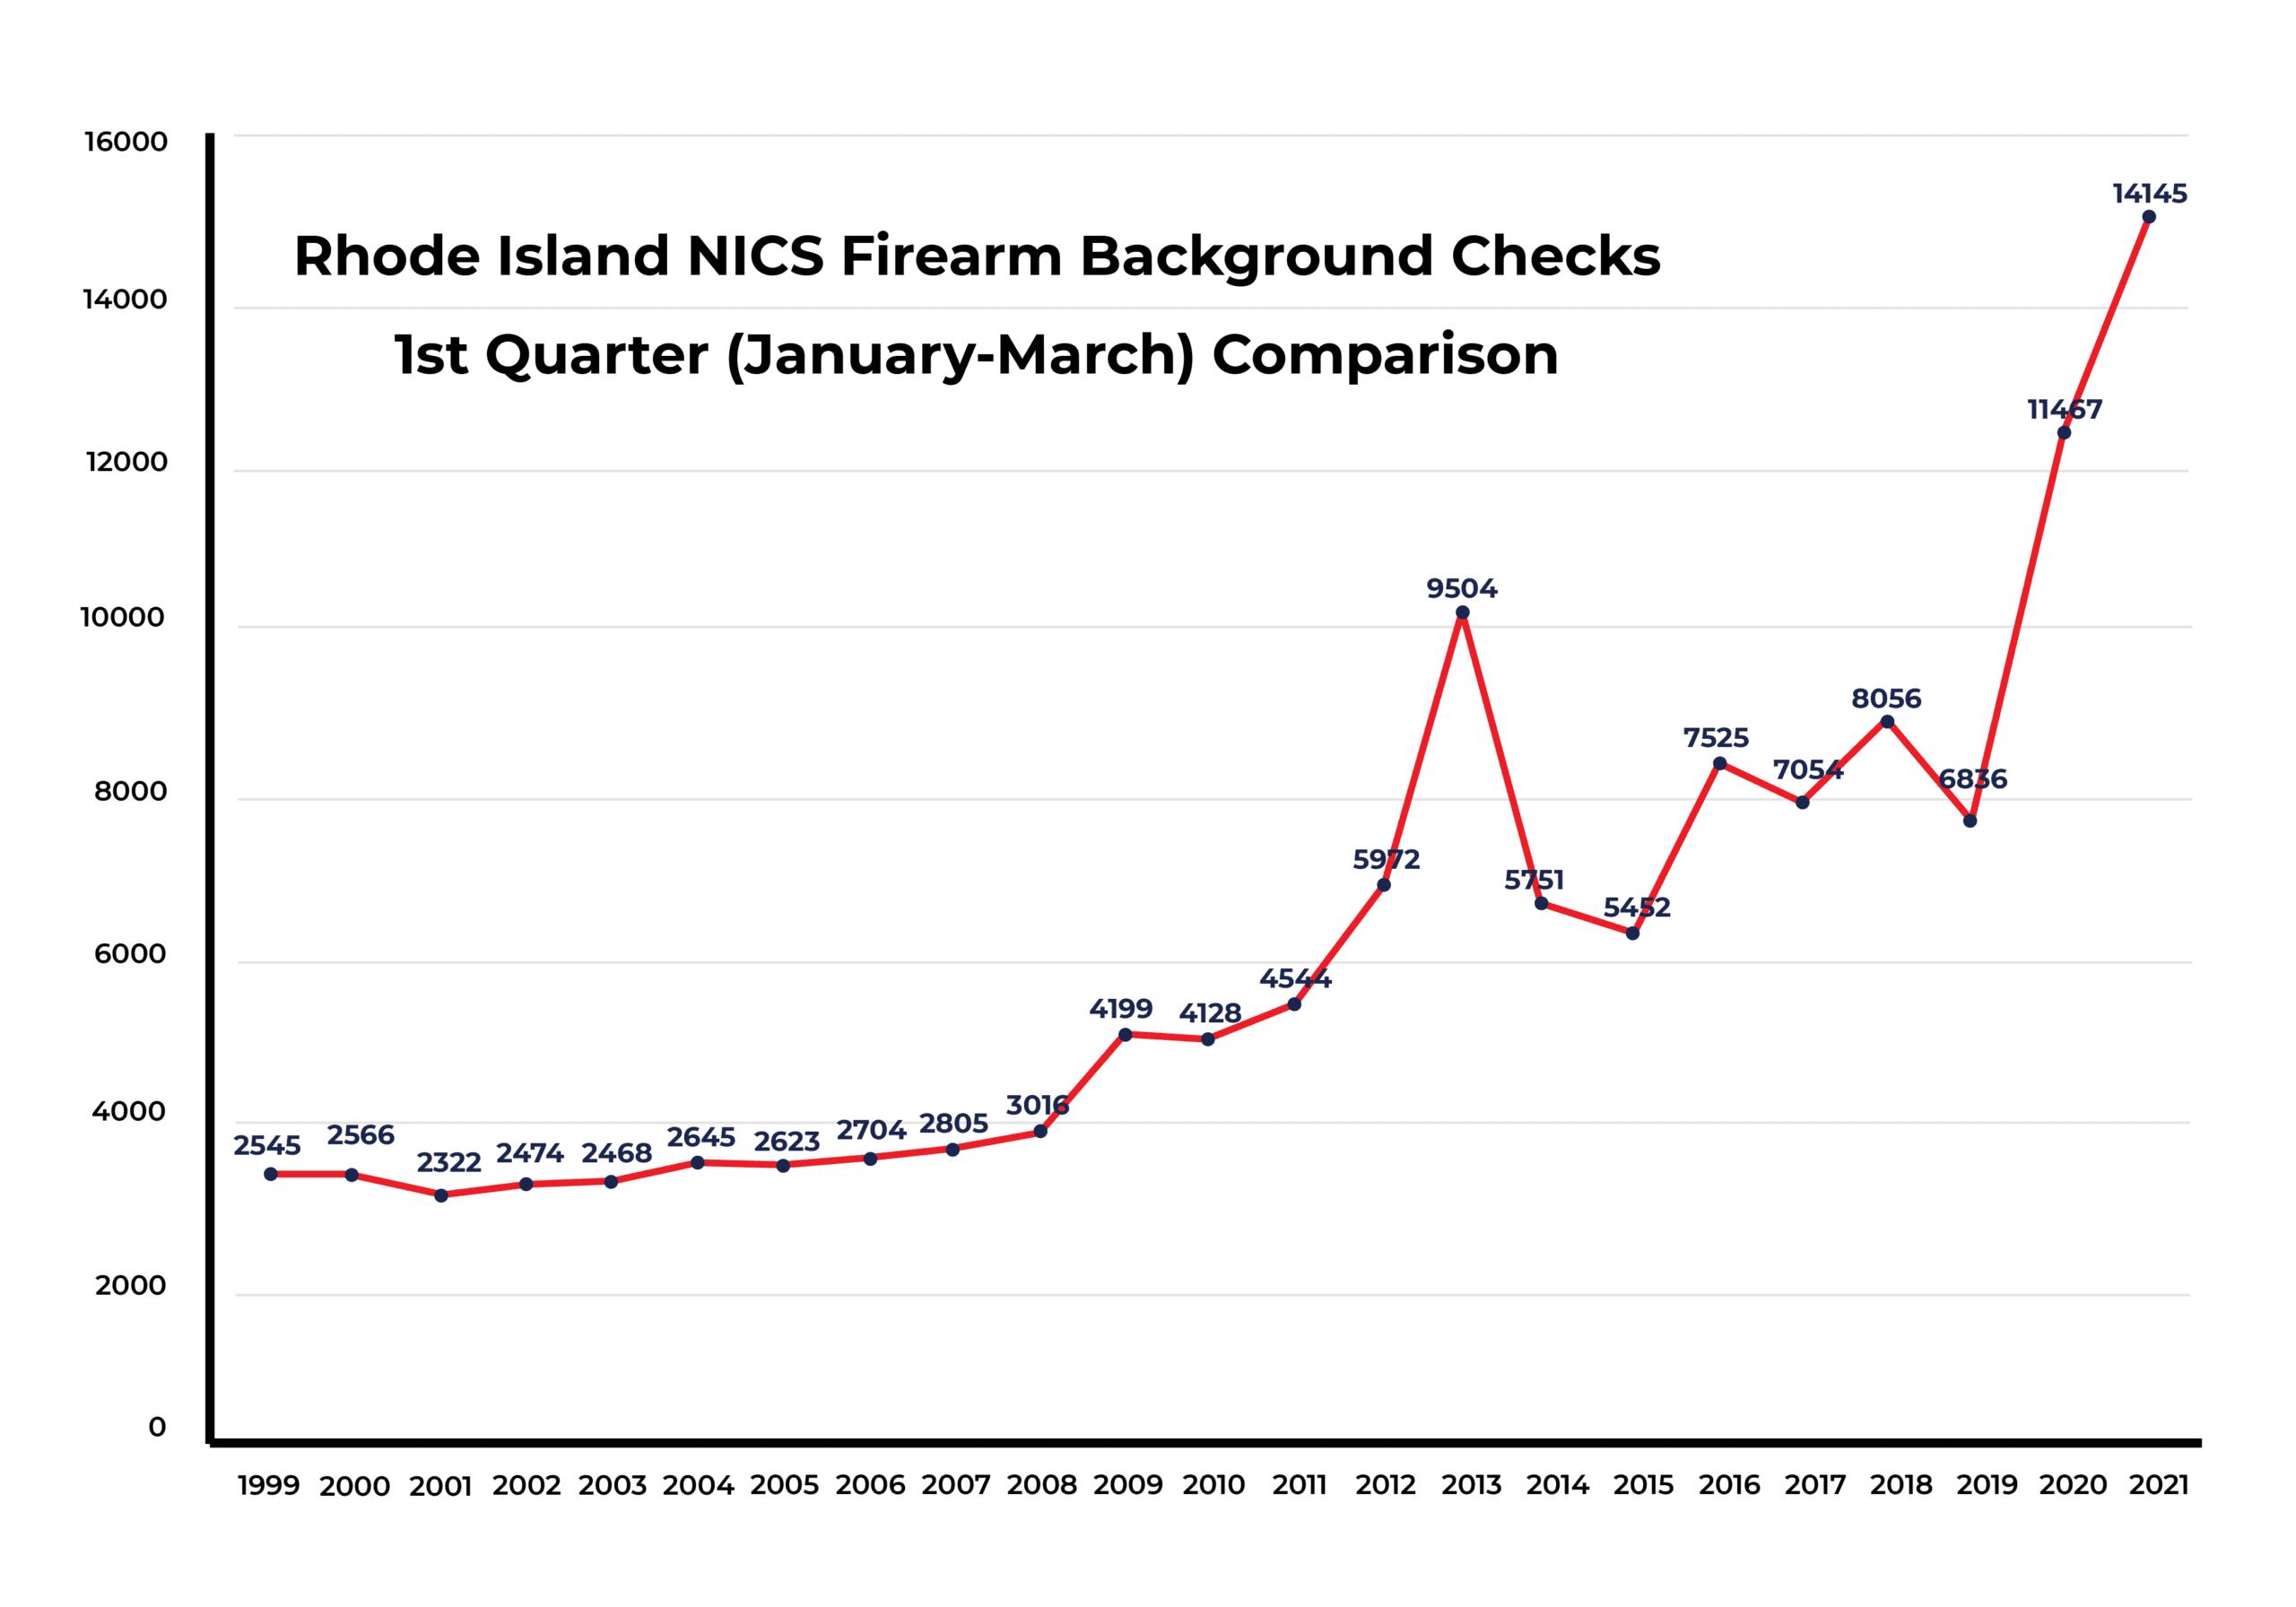 RI NICS firearm background checks continue to soar in 2021